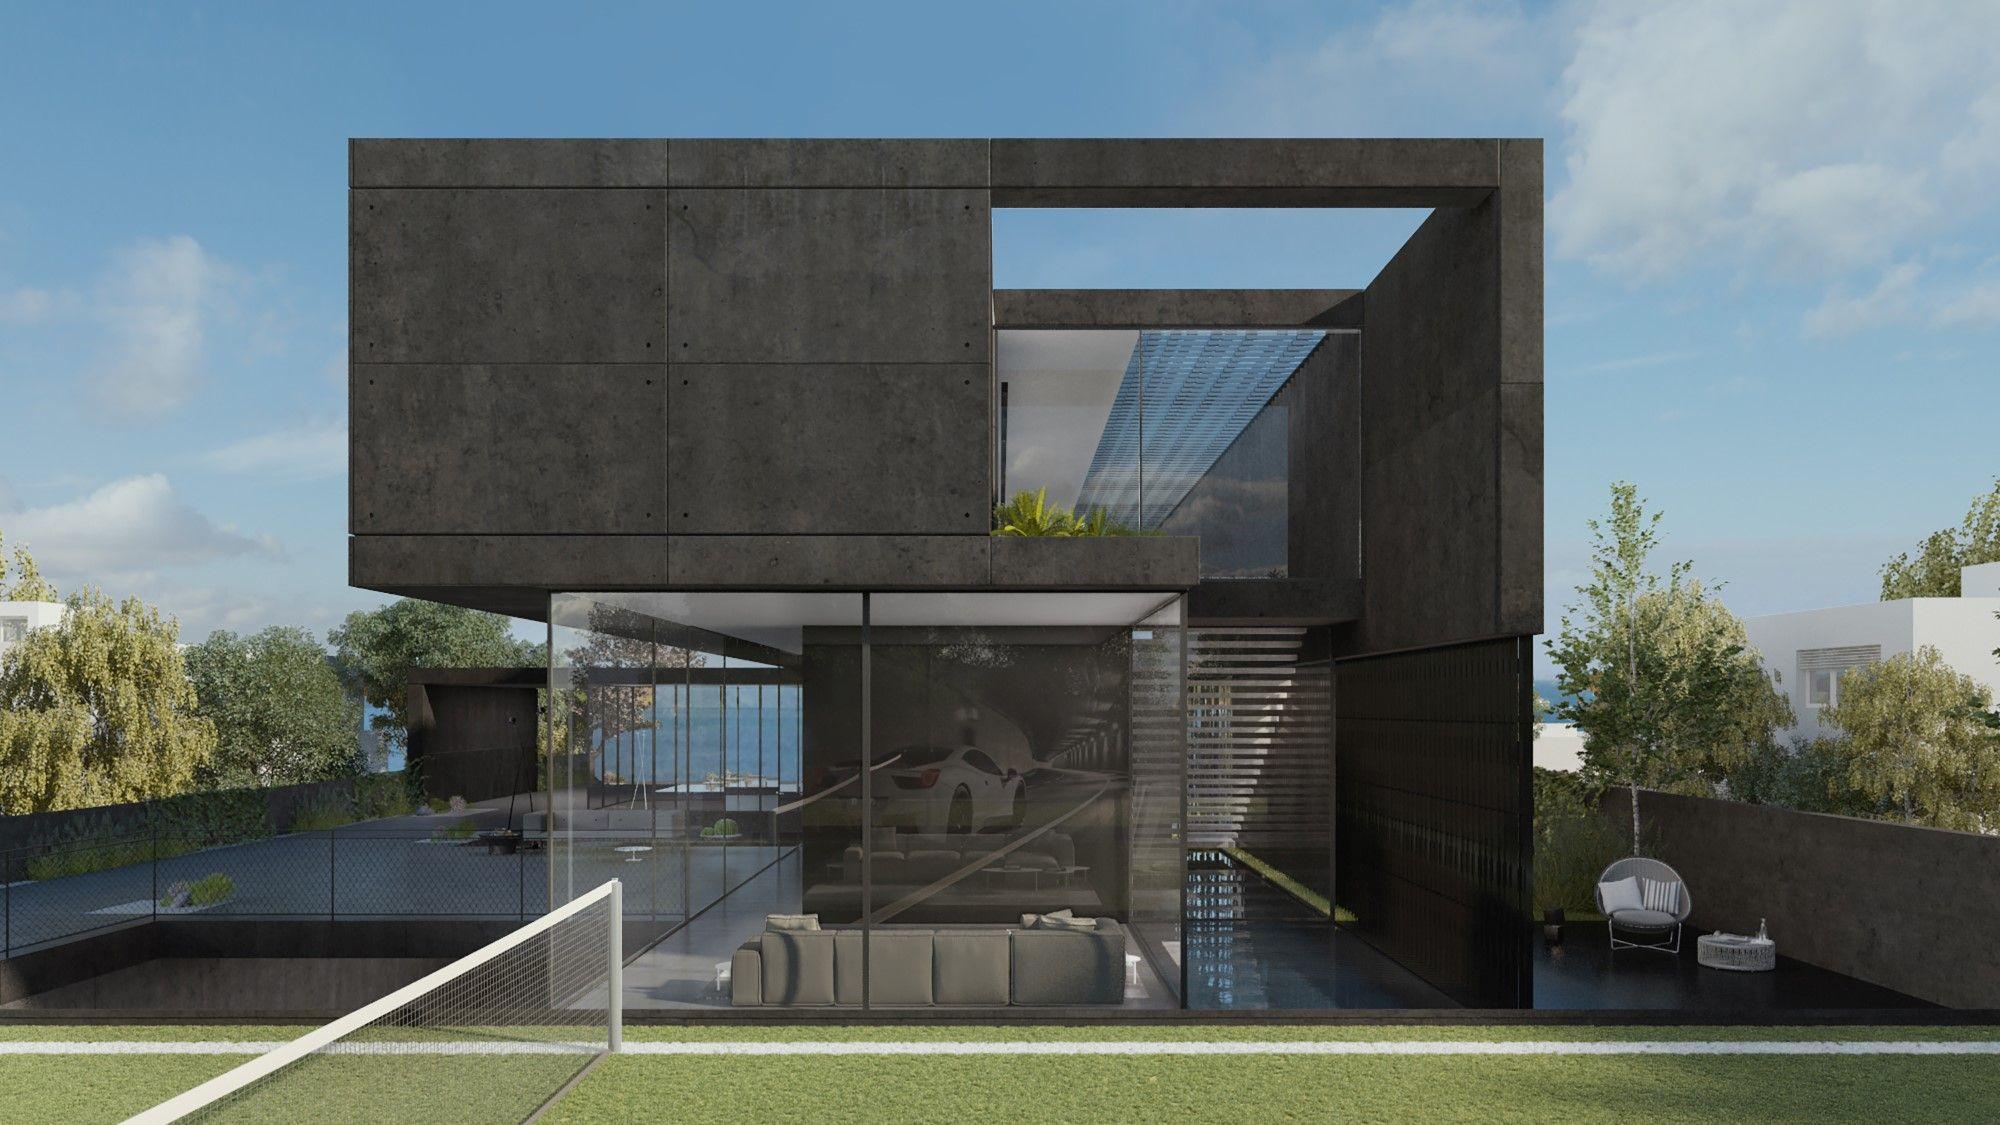 Black Concrete House - Pitsou Kedem | Renderings in 2019 ...